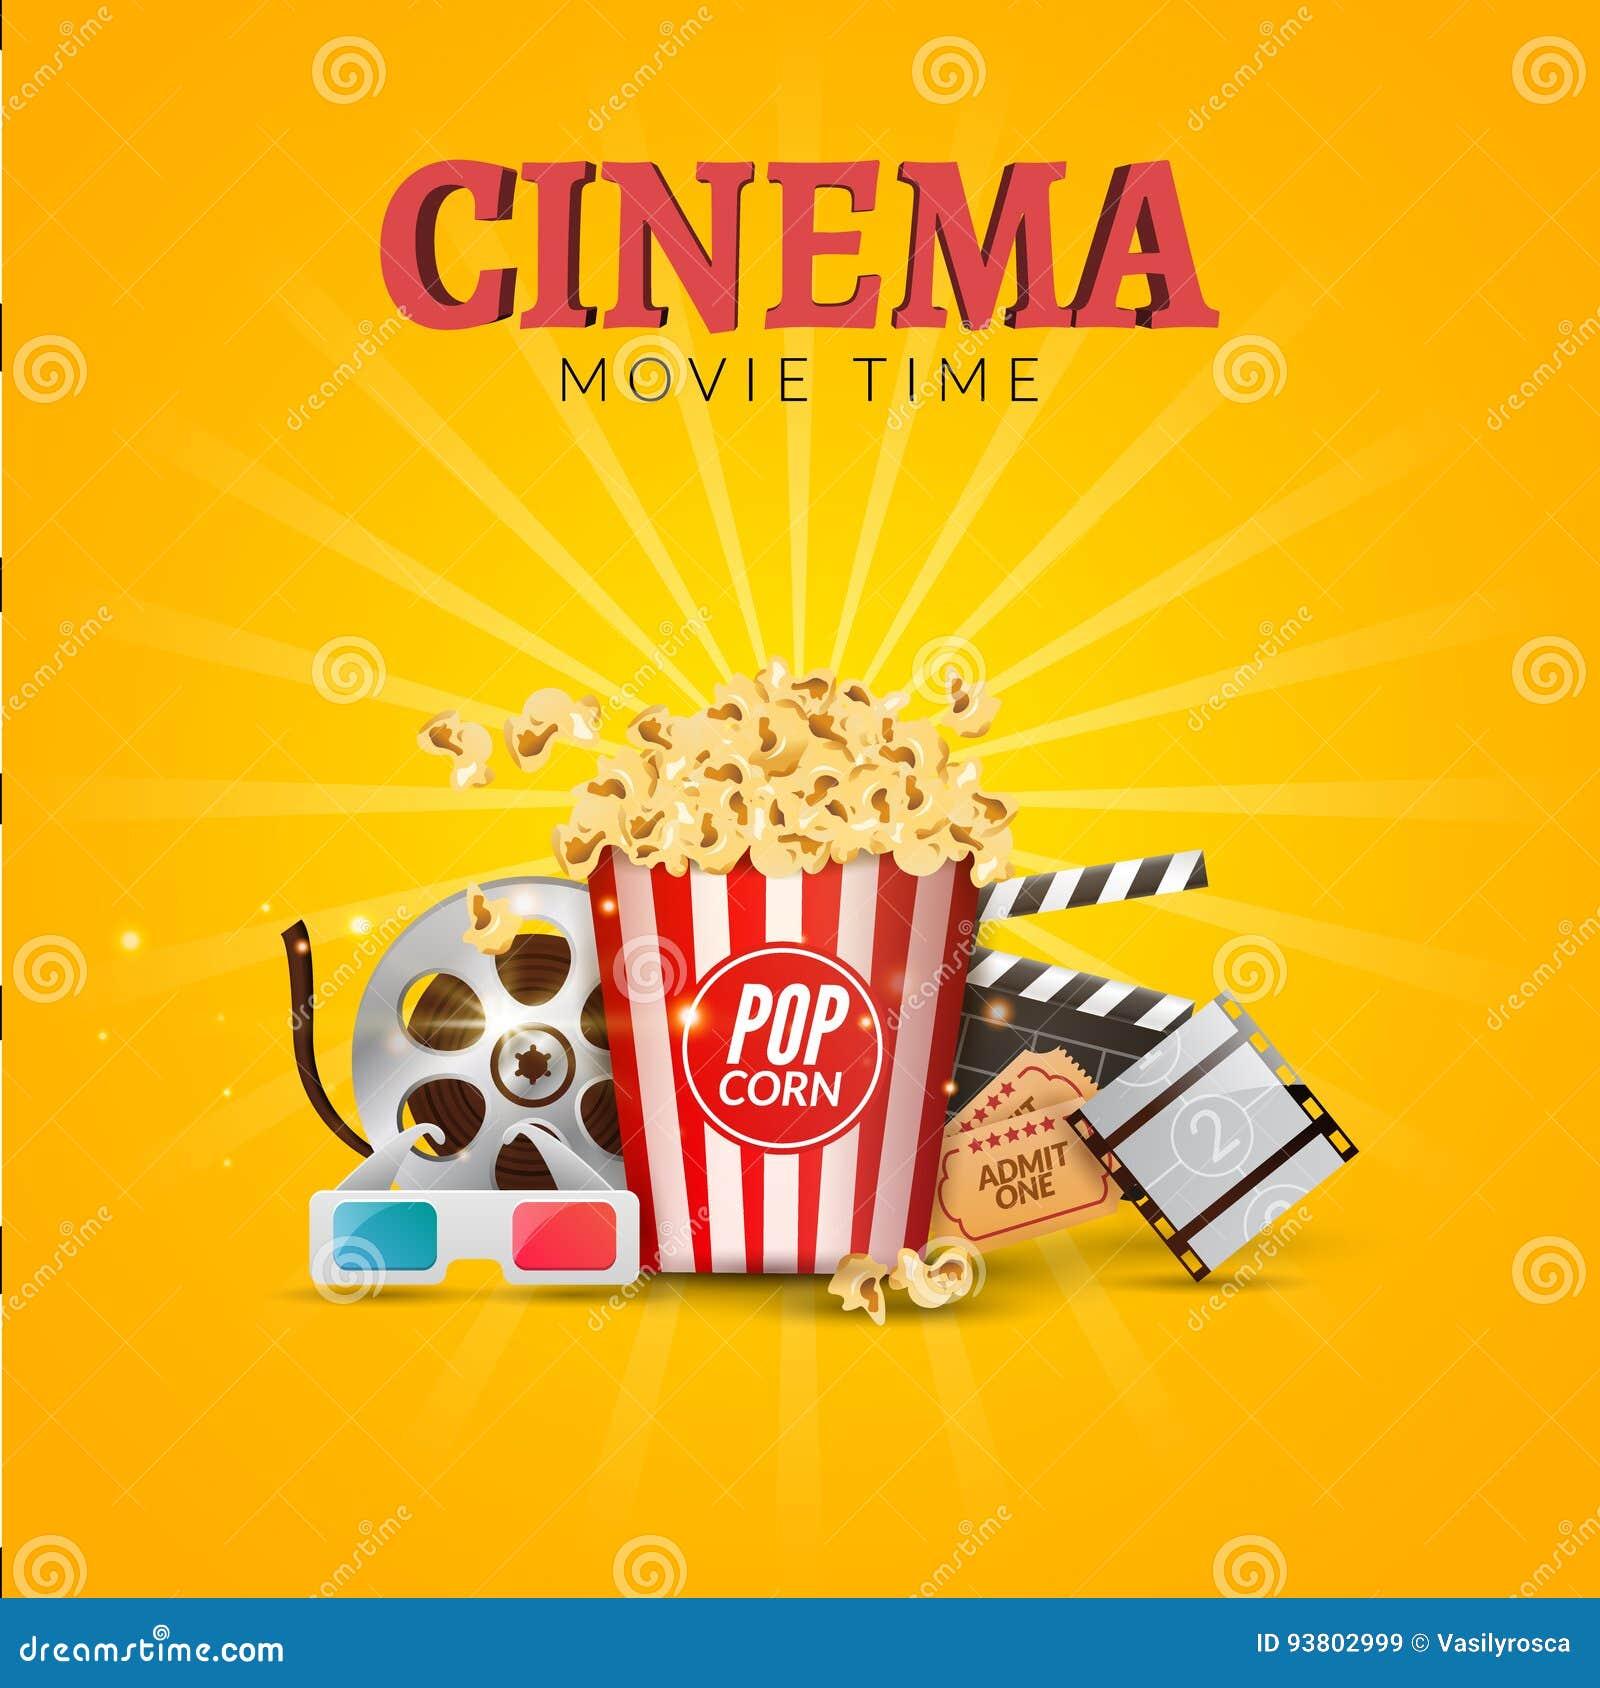 cinema movie vector poster design template popcorn filmstrip